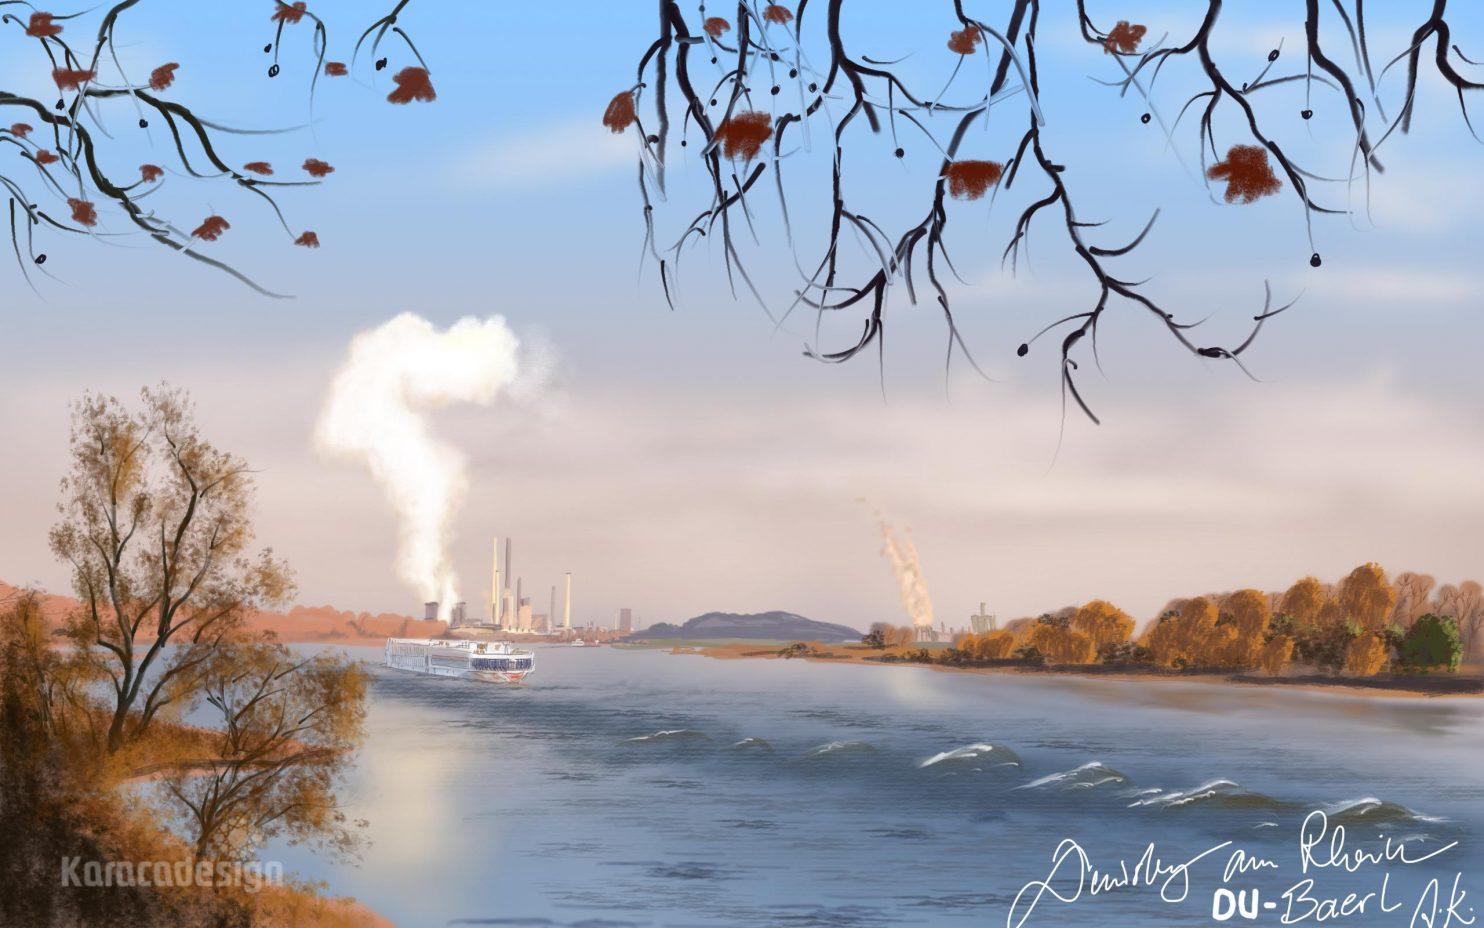 Rhein Duisburg Baerl